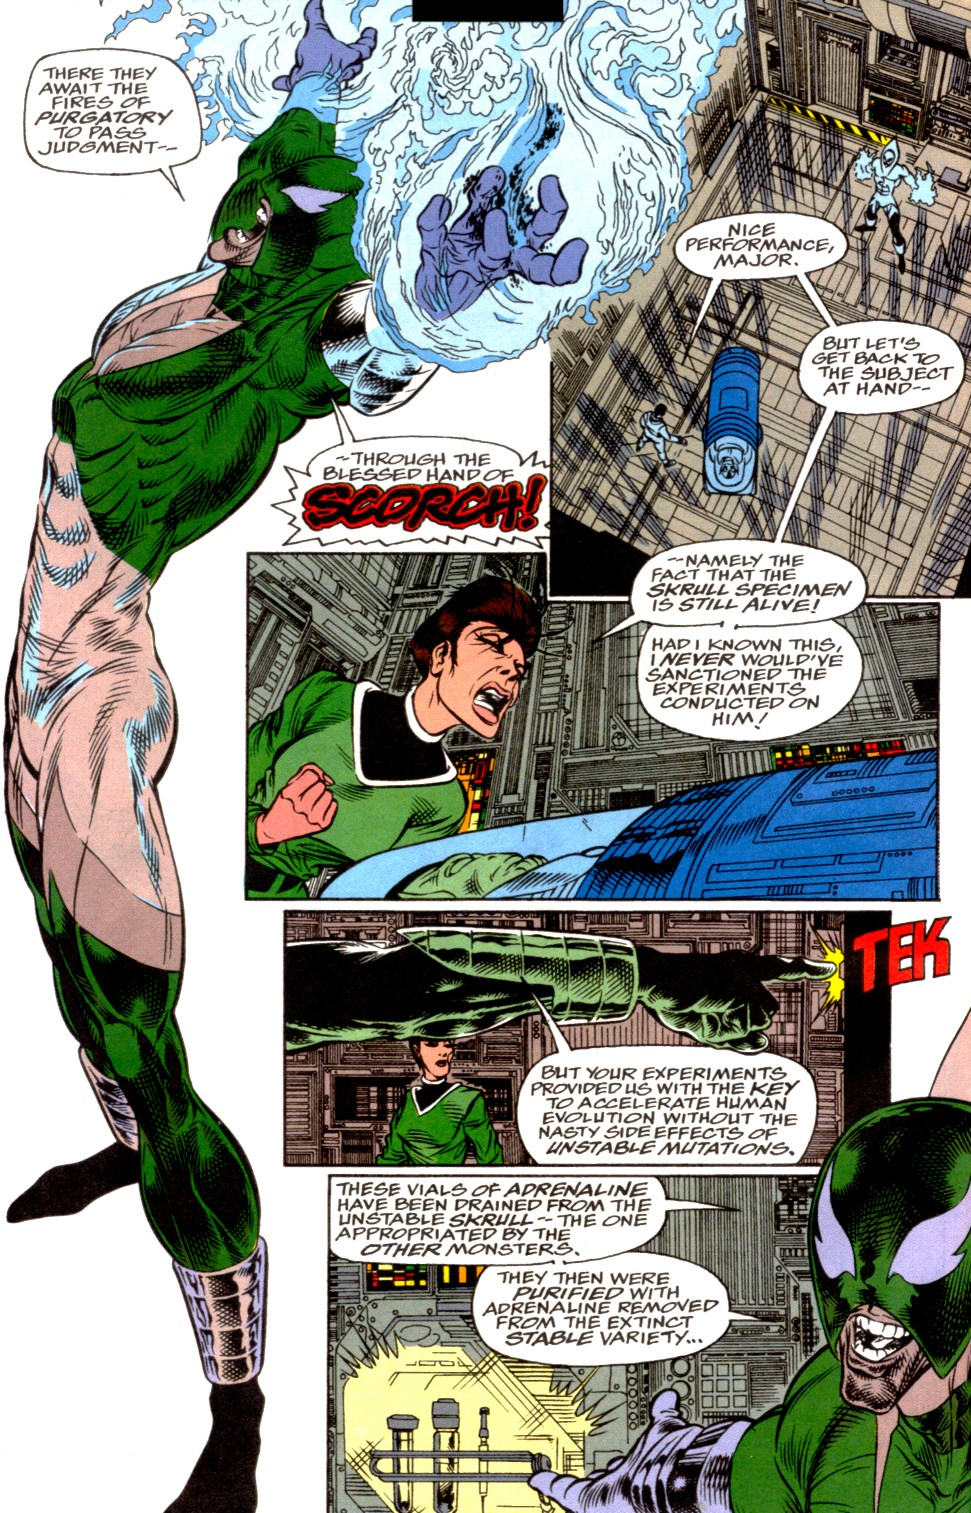 Read online Blackwulf comic -  Issue #4 - 3